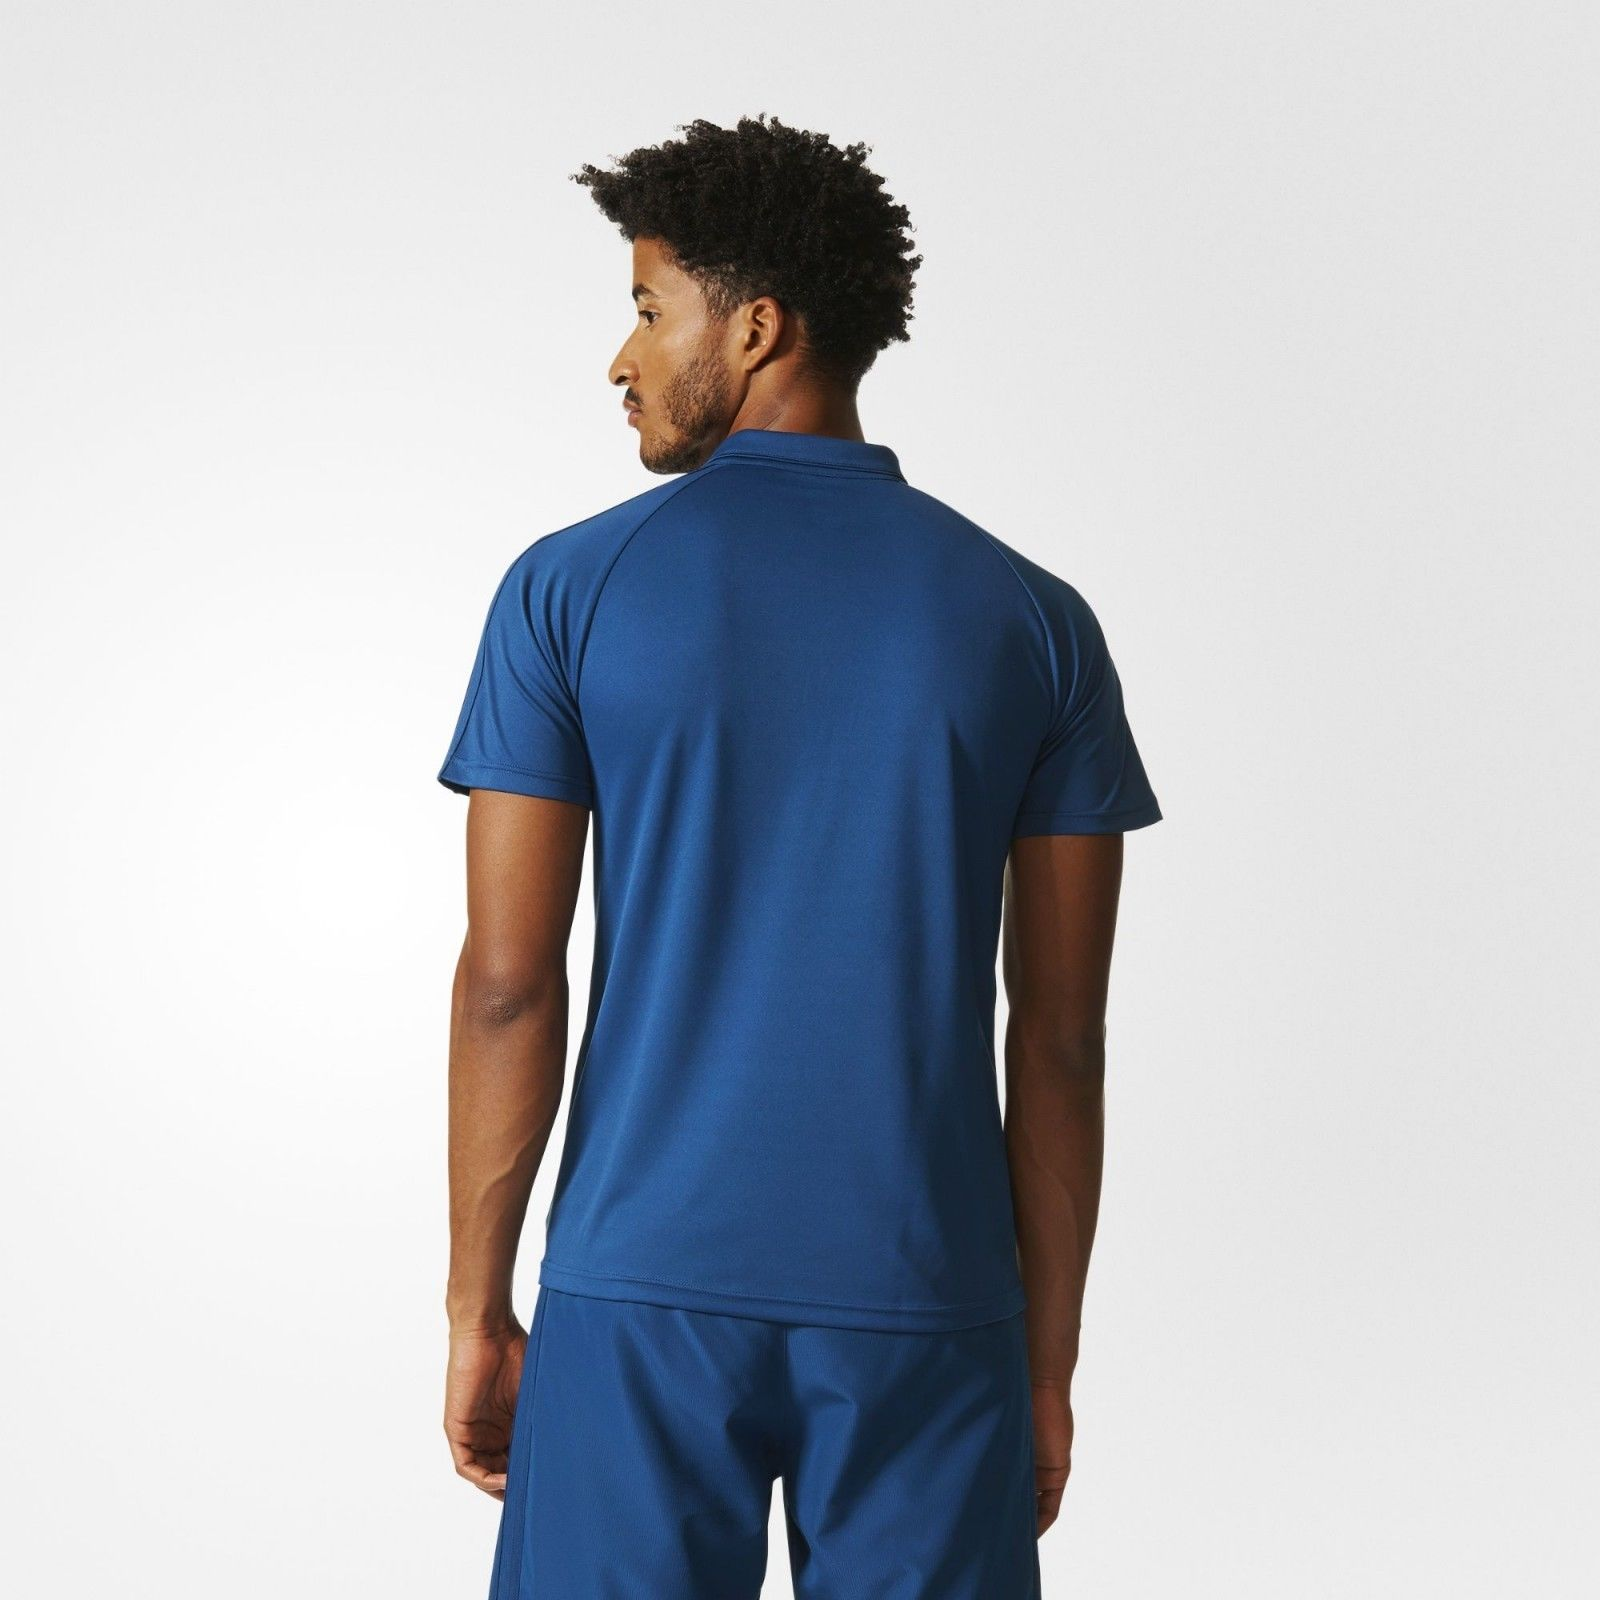 T-Shirt Juventus Juve Adidas Uomo 3 striscie Nero Beige CW8733